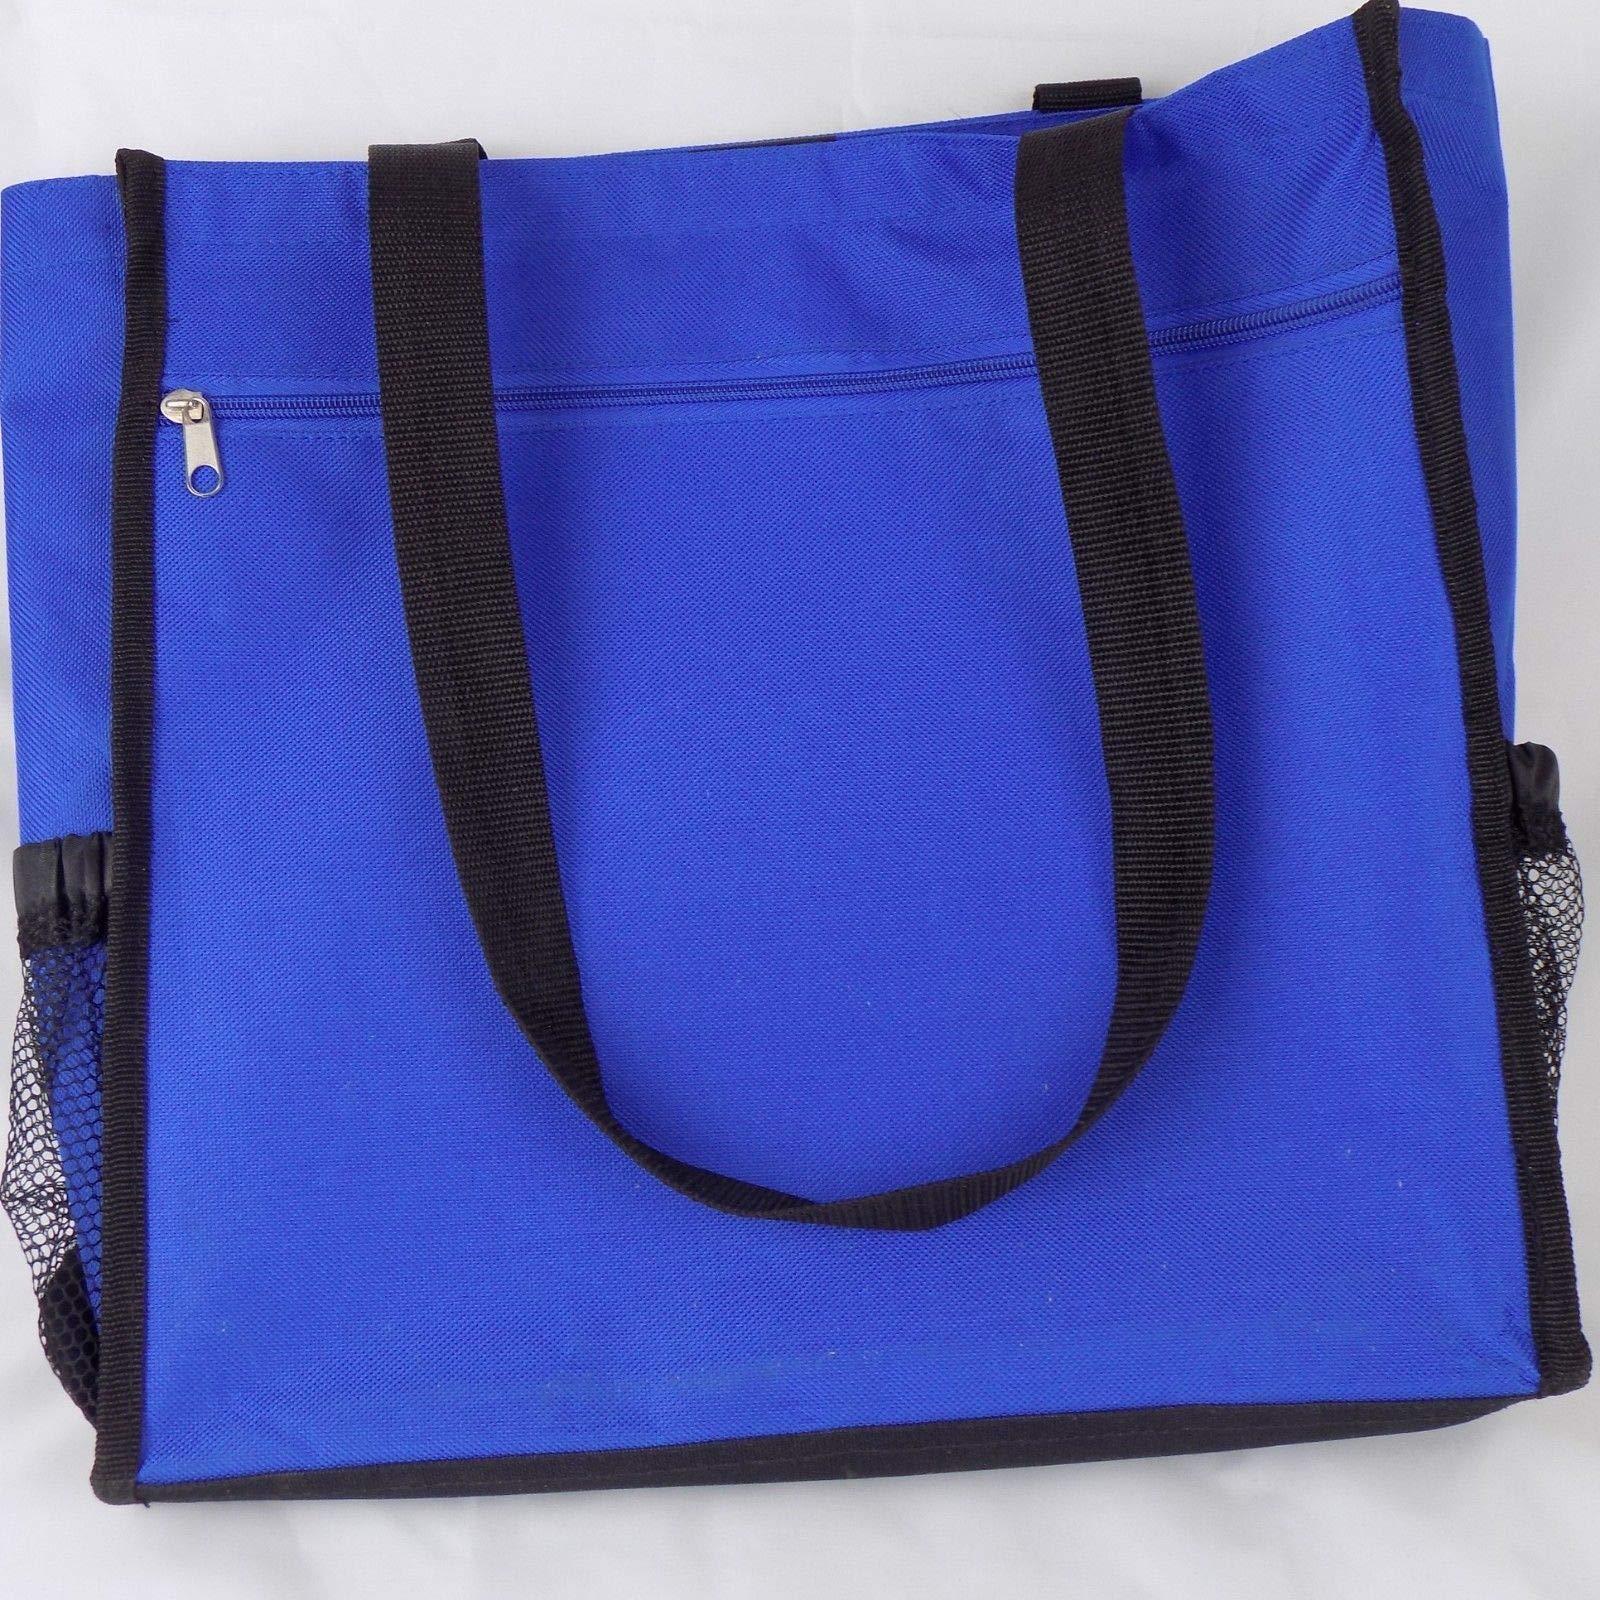 Scrapbook Paper Tote Blue Bag Inner Dividers 14'' W x 13.25'' H x 4.5'' D Strap